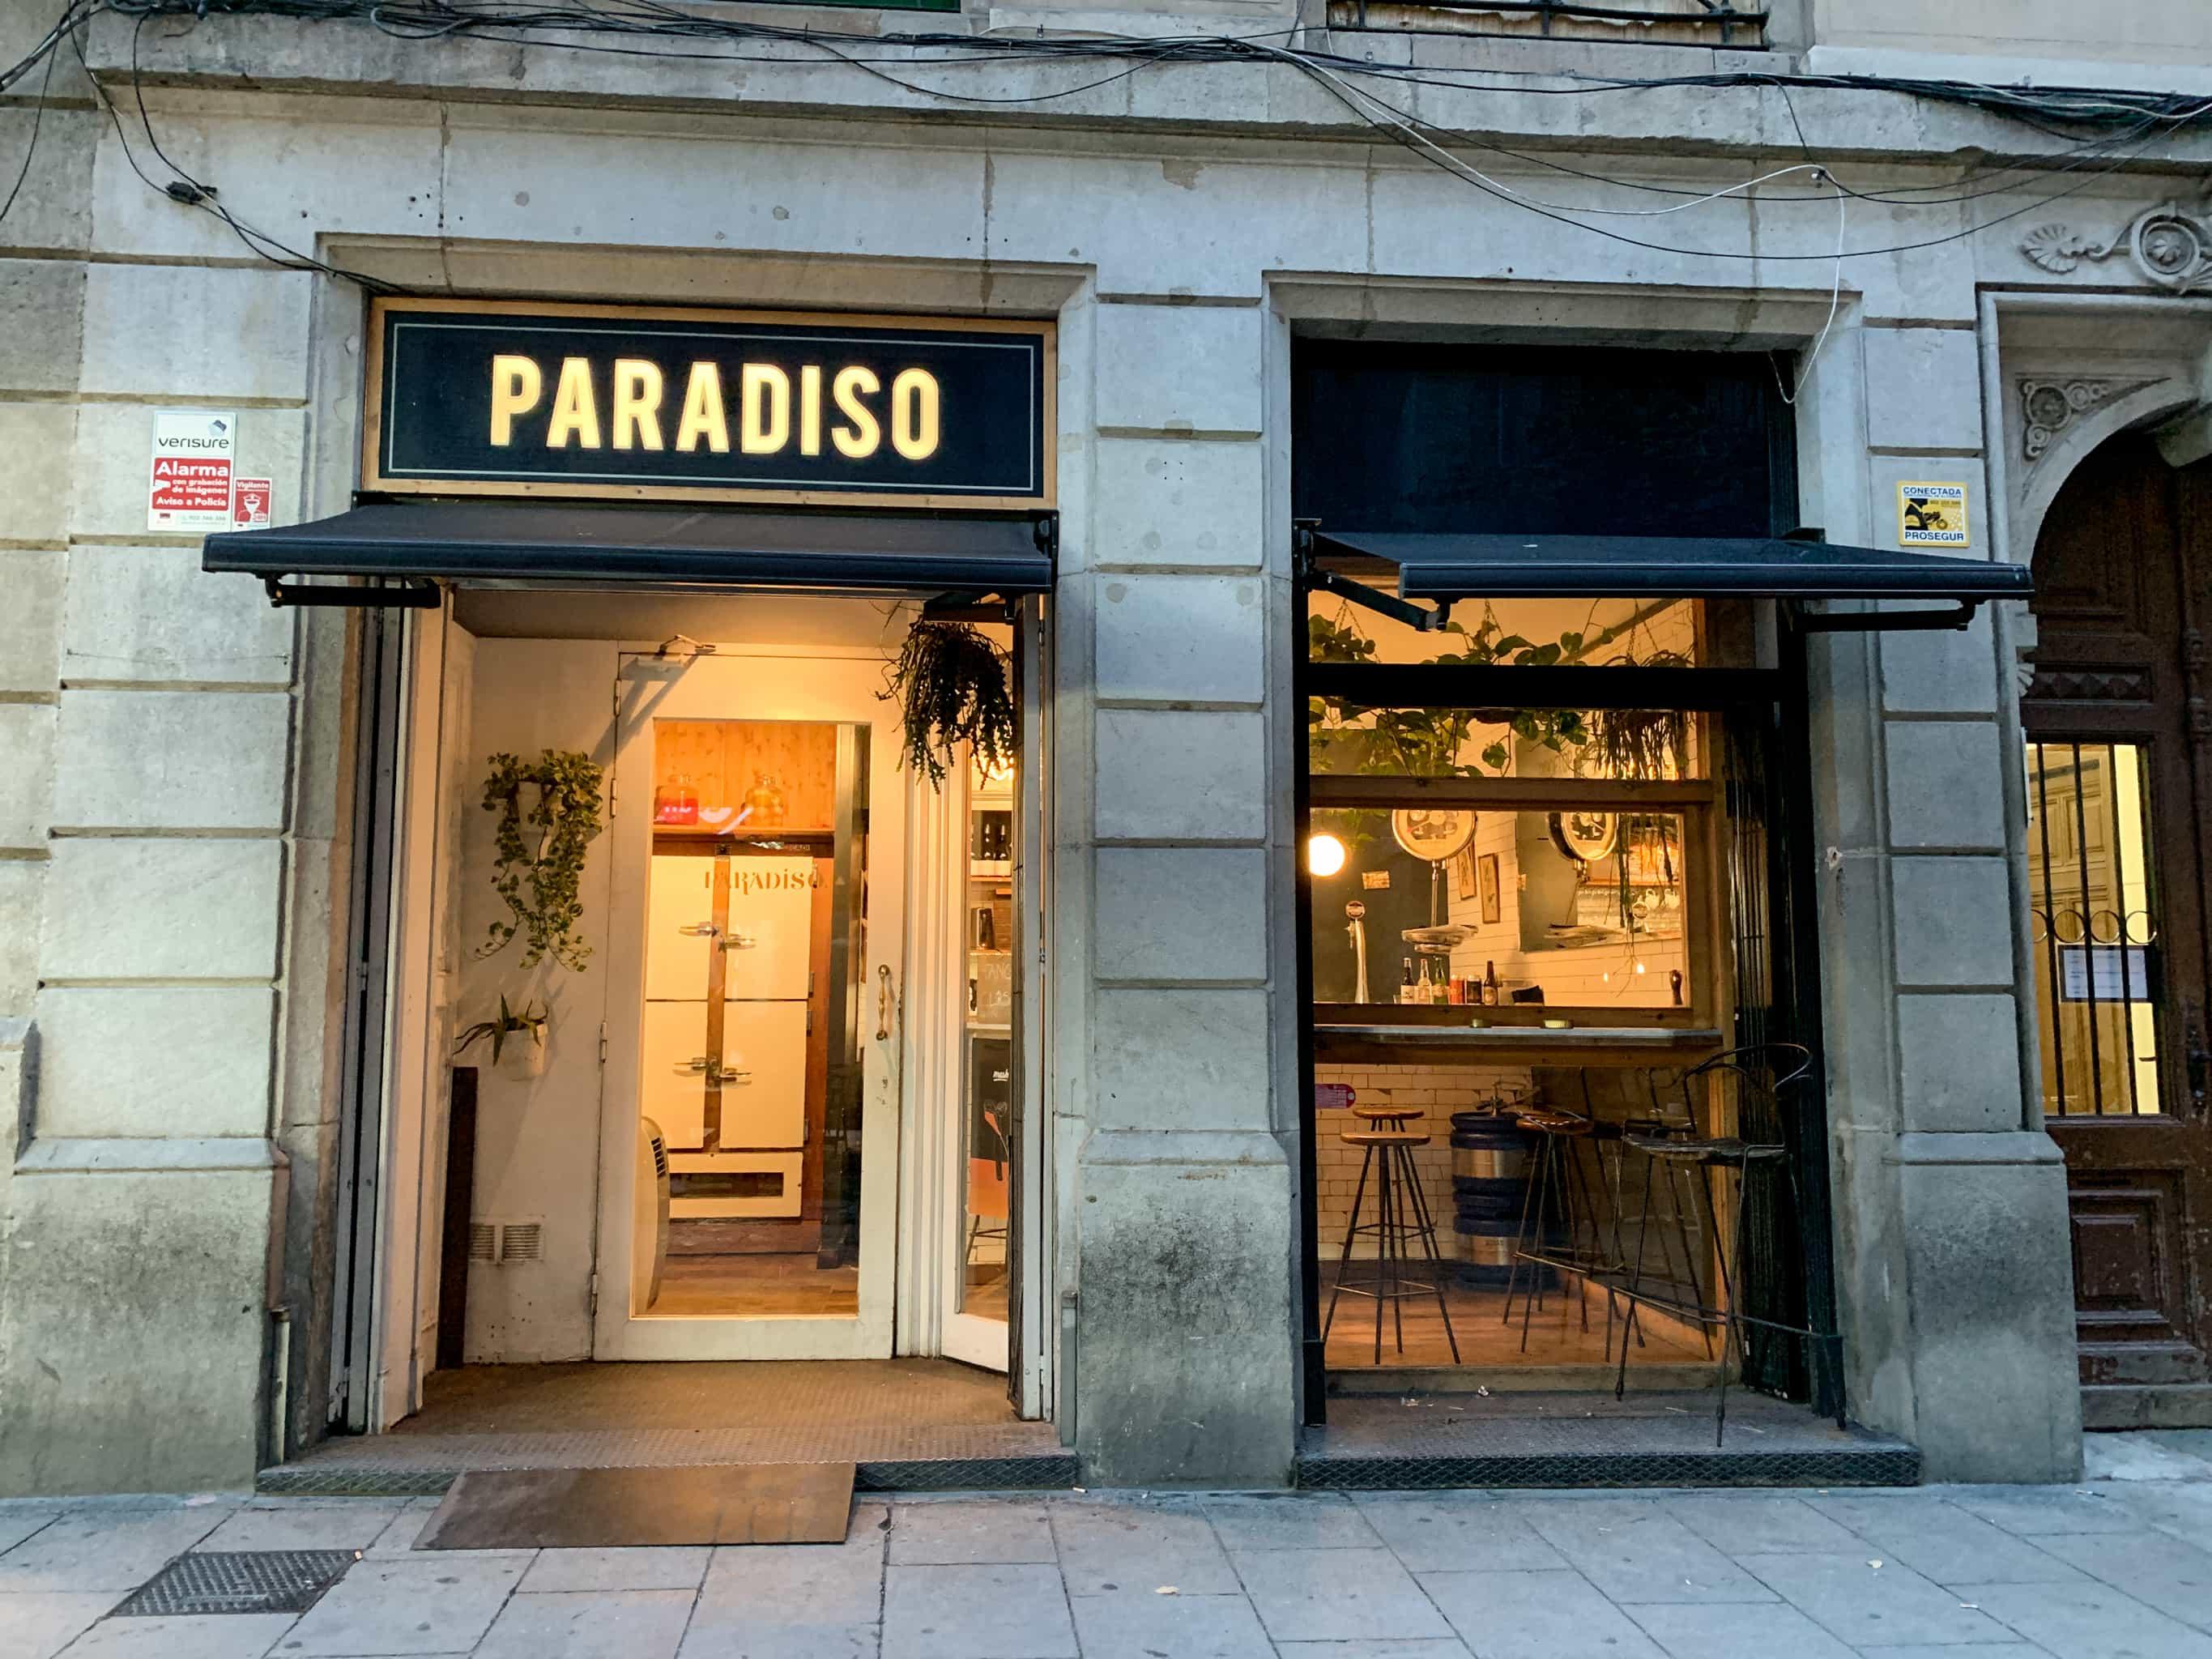 Entrance to Paradiso bar in Barcelona